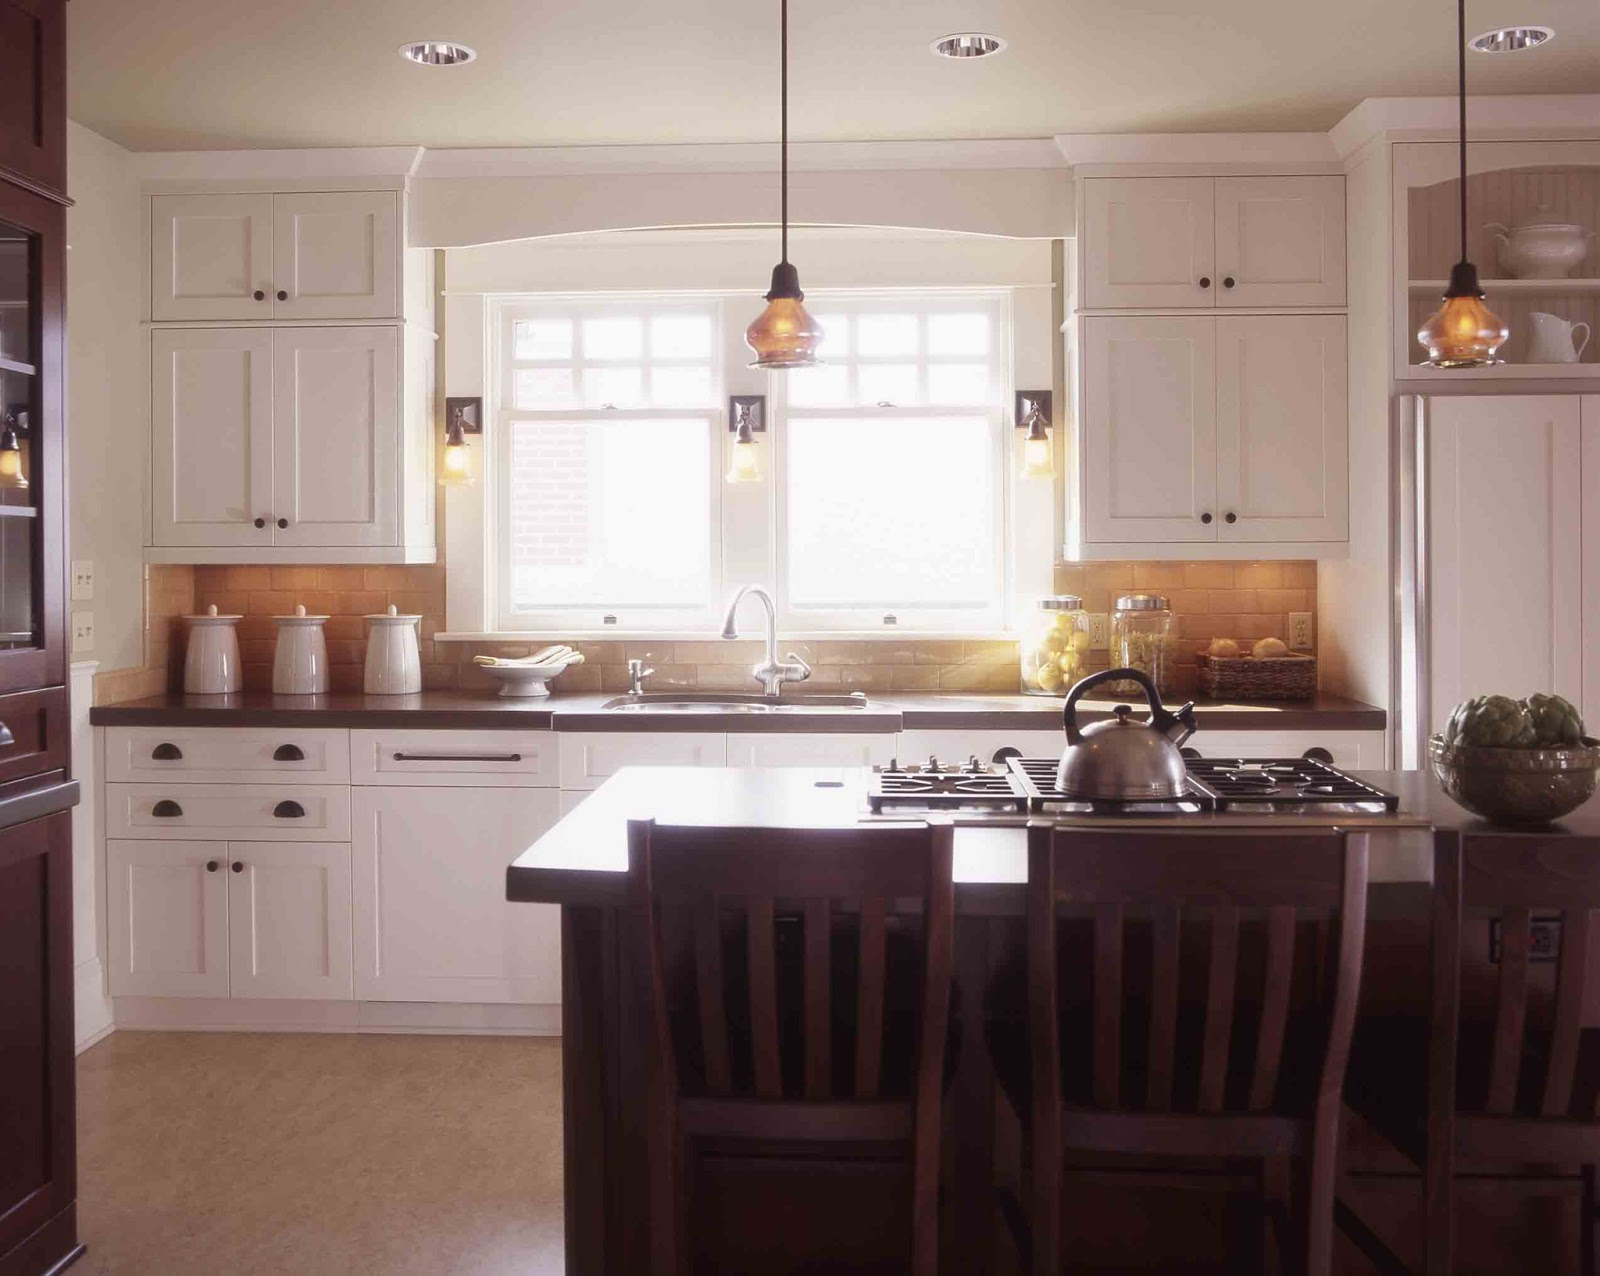 Kitchen Cabinets Styles Remodeling Naples Fl The Granite Gurus Design Style Week 10 Craftsman